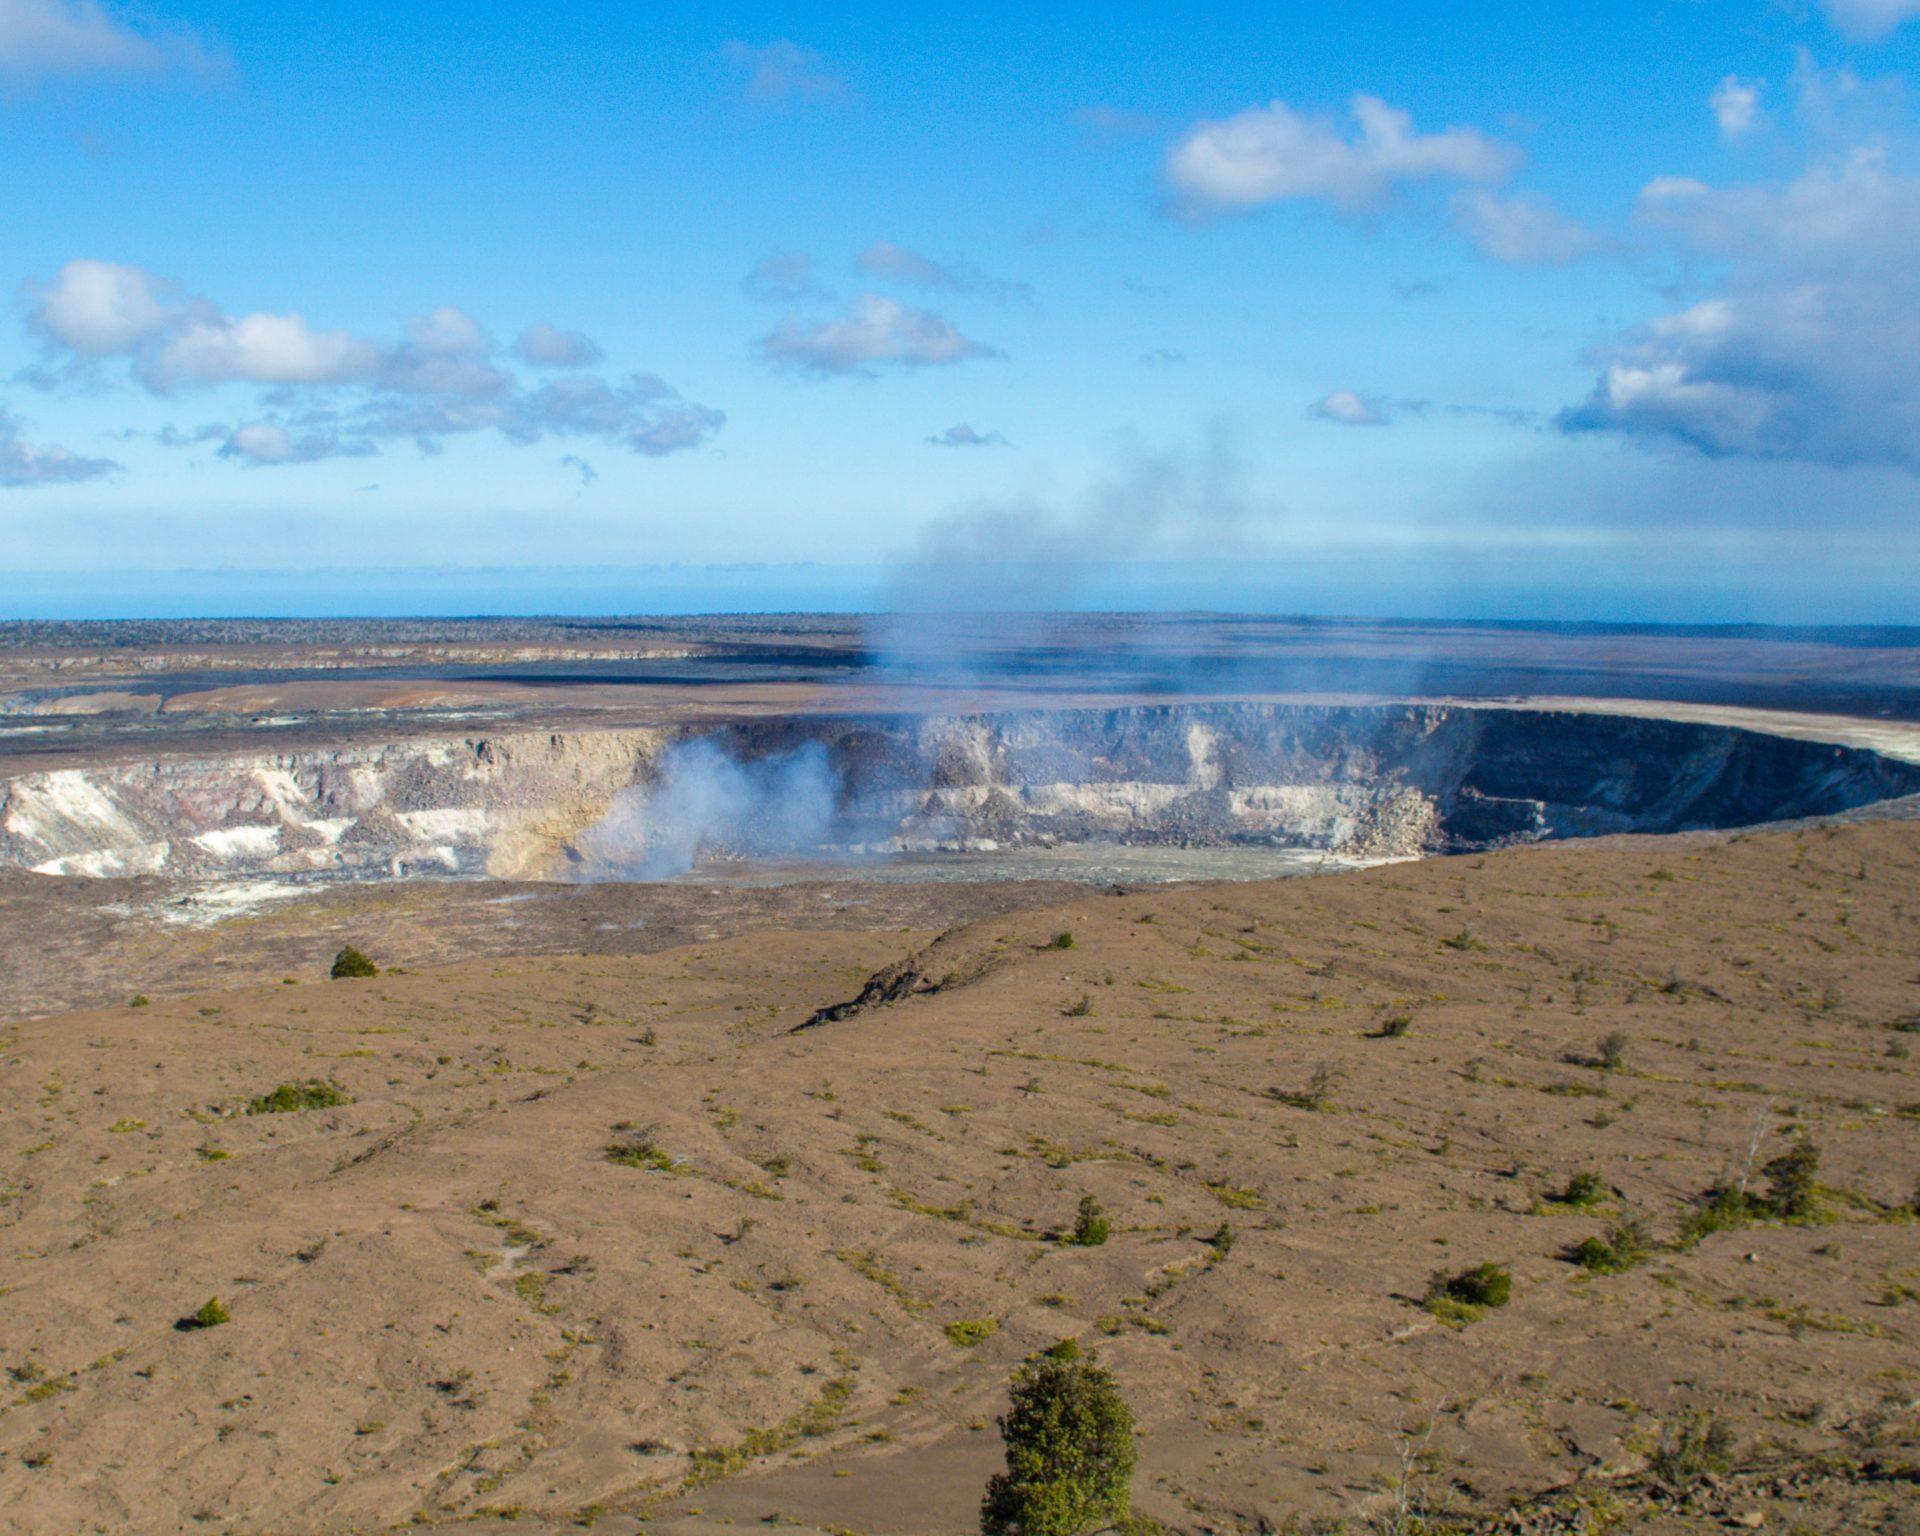 The Halema'uma'u Crater at Hawaii Volcanoes National Park can be seen steaming.